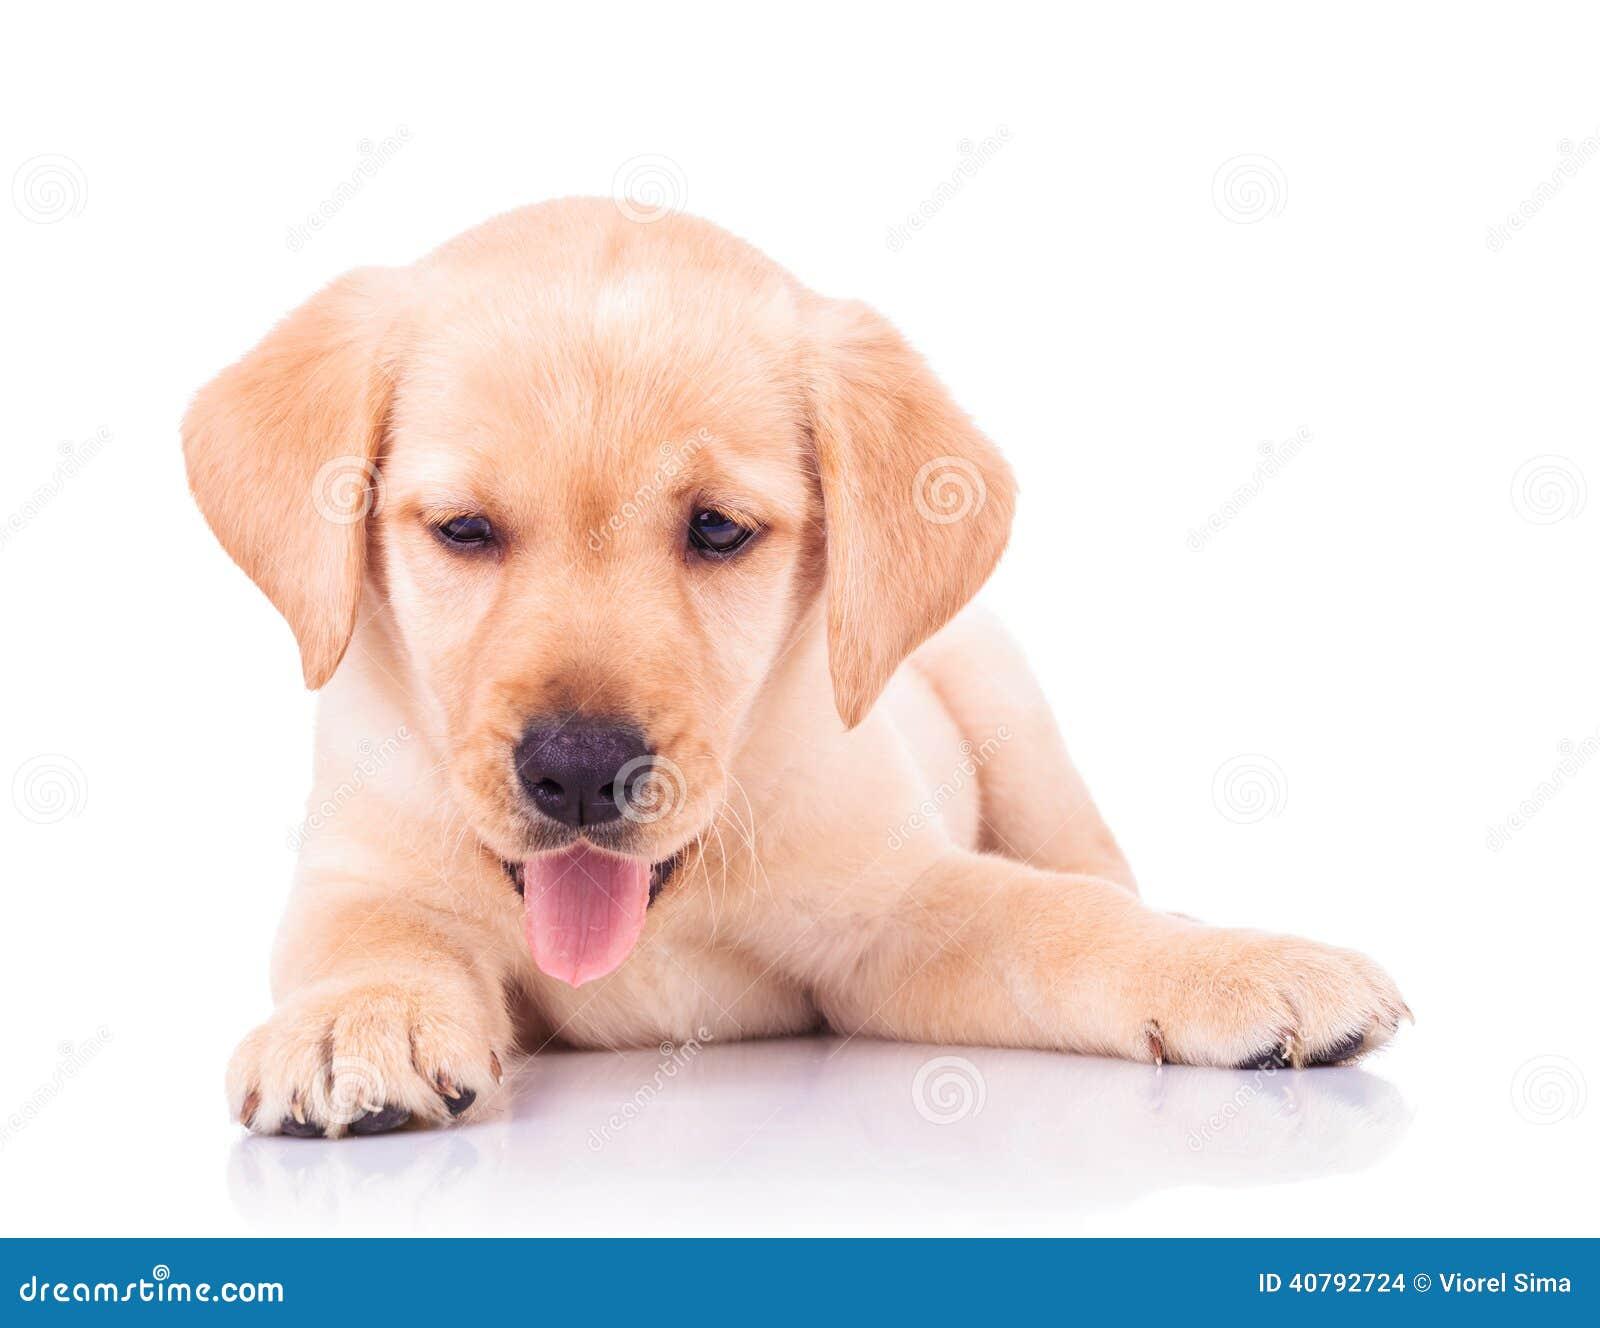 Panting Labrador Retriever Puppy Dog Lying Down Stock Photo Image